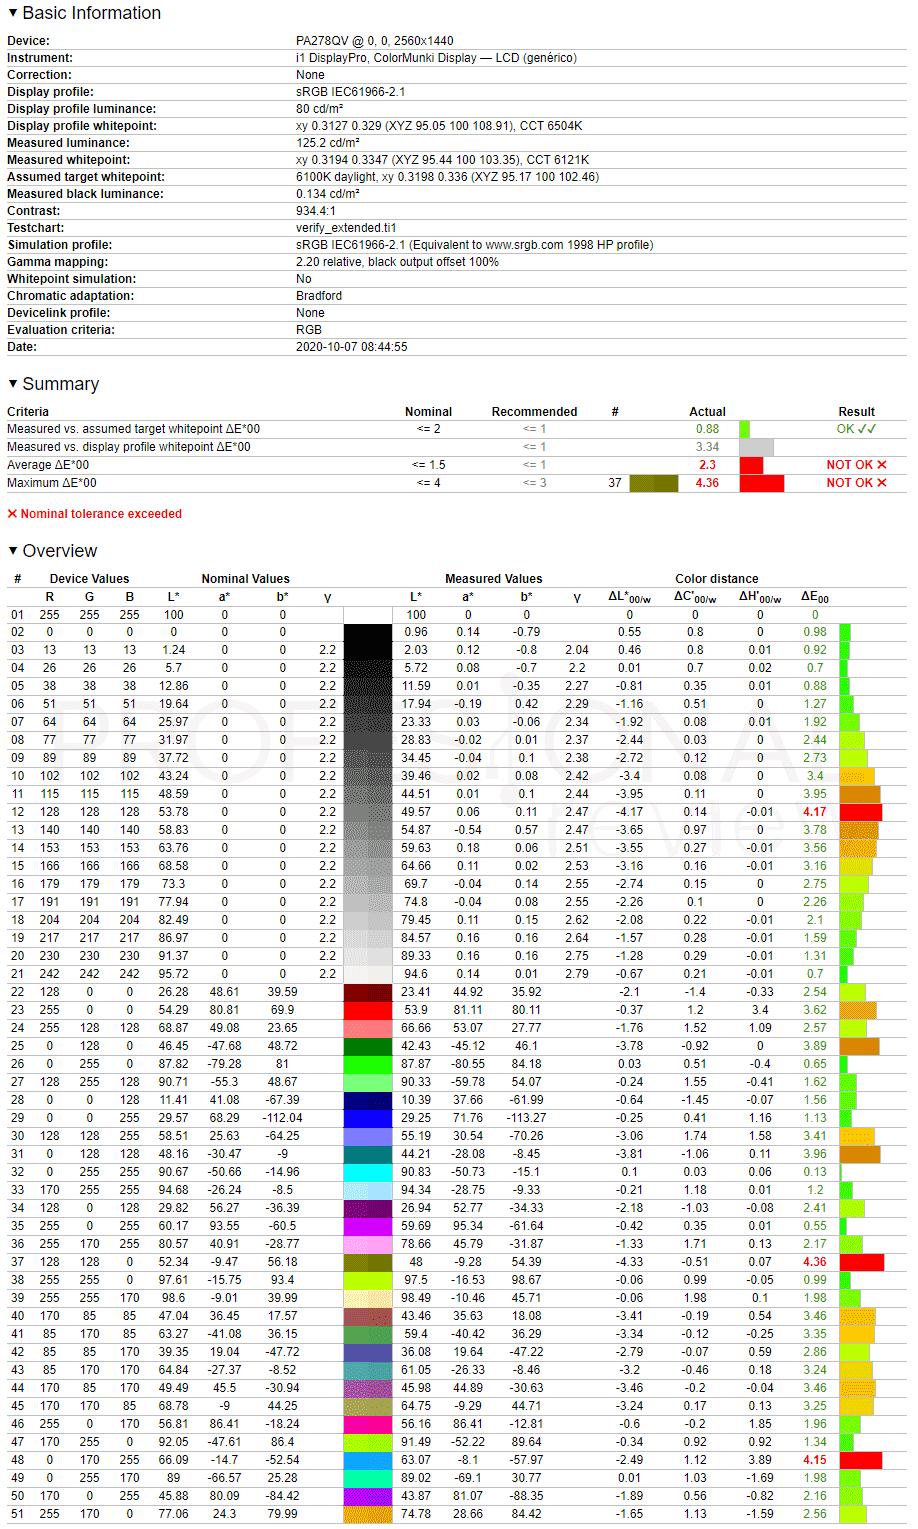 Asus ProArt PA278QV sRGB